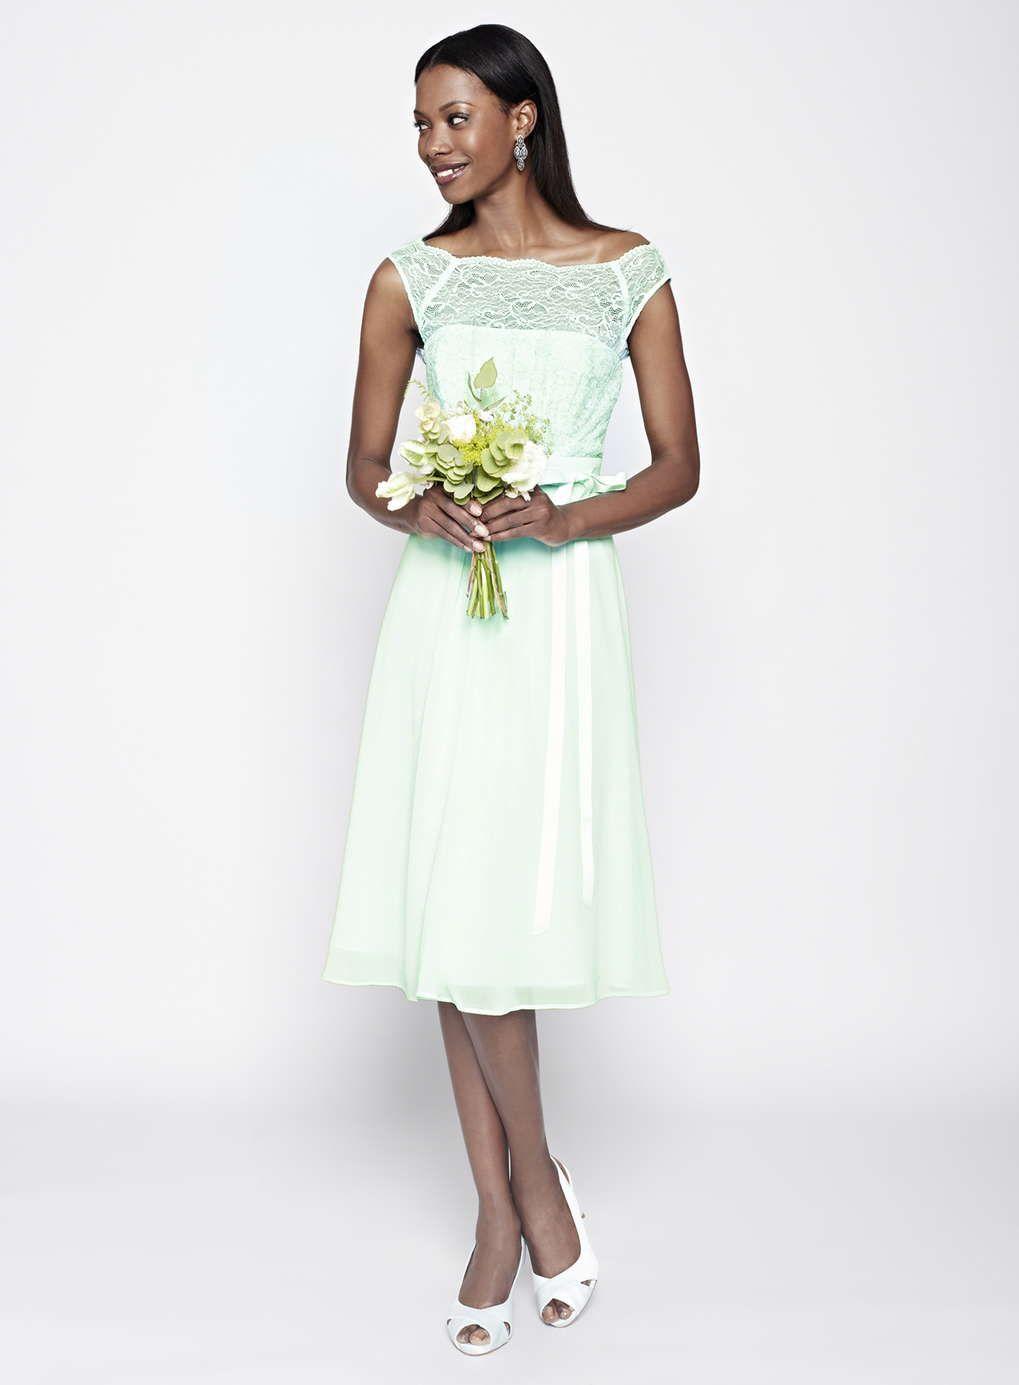 Light mint chloe bridesmaid dress bridesmaid dress ideas light mint chloe bridesmaid dress bridesmaid dress ideas ombrellifo Image collections